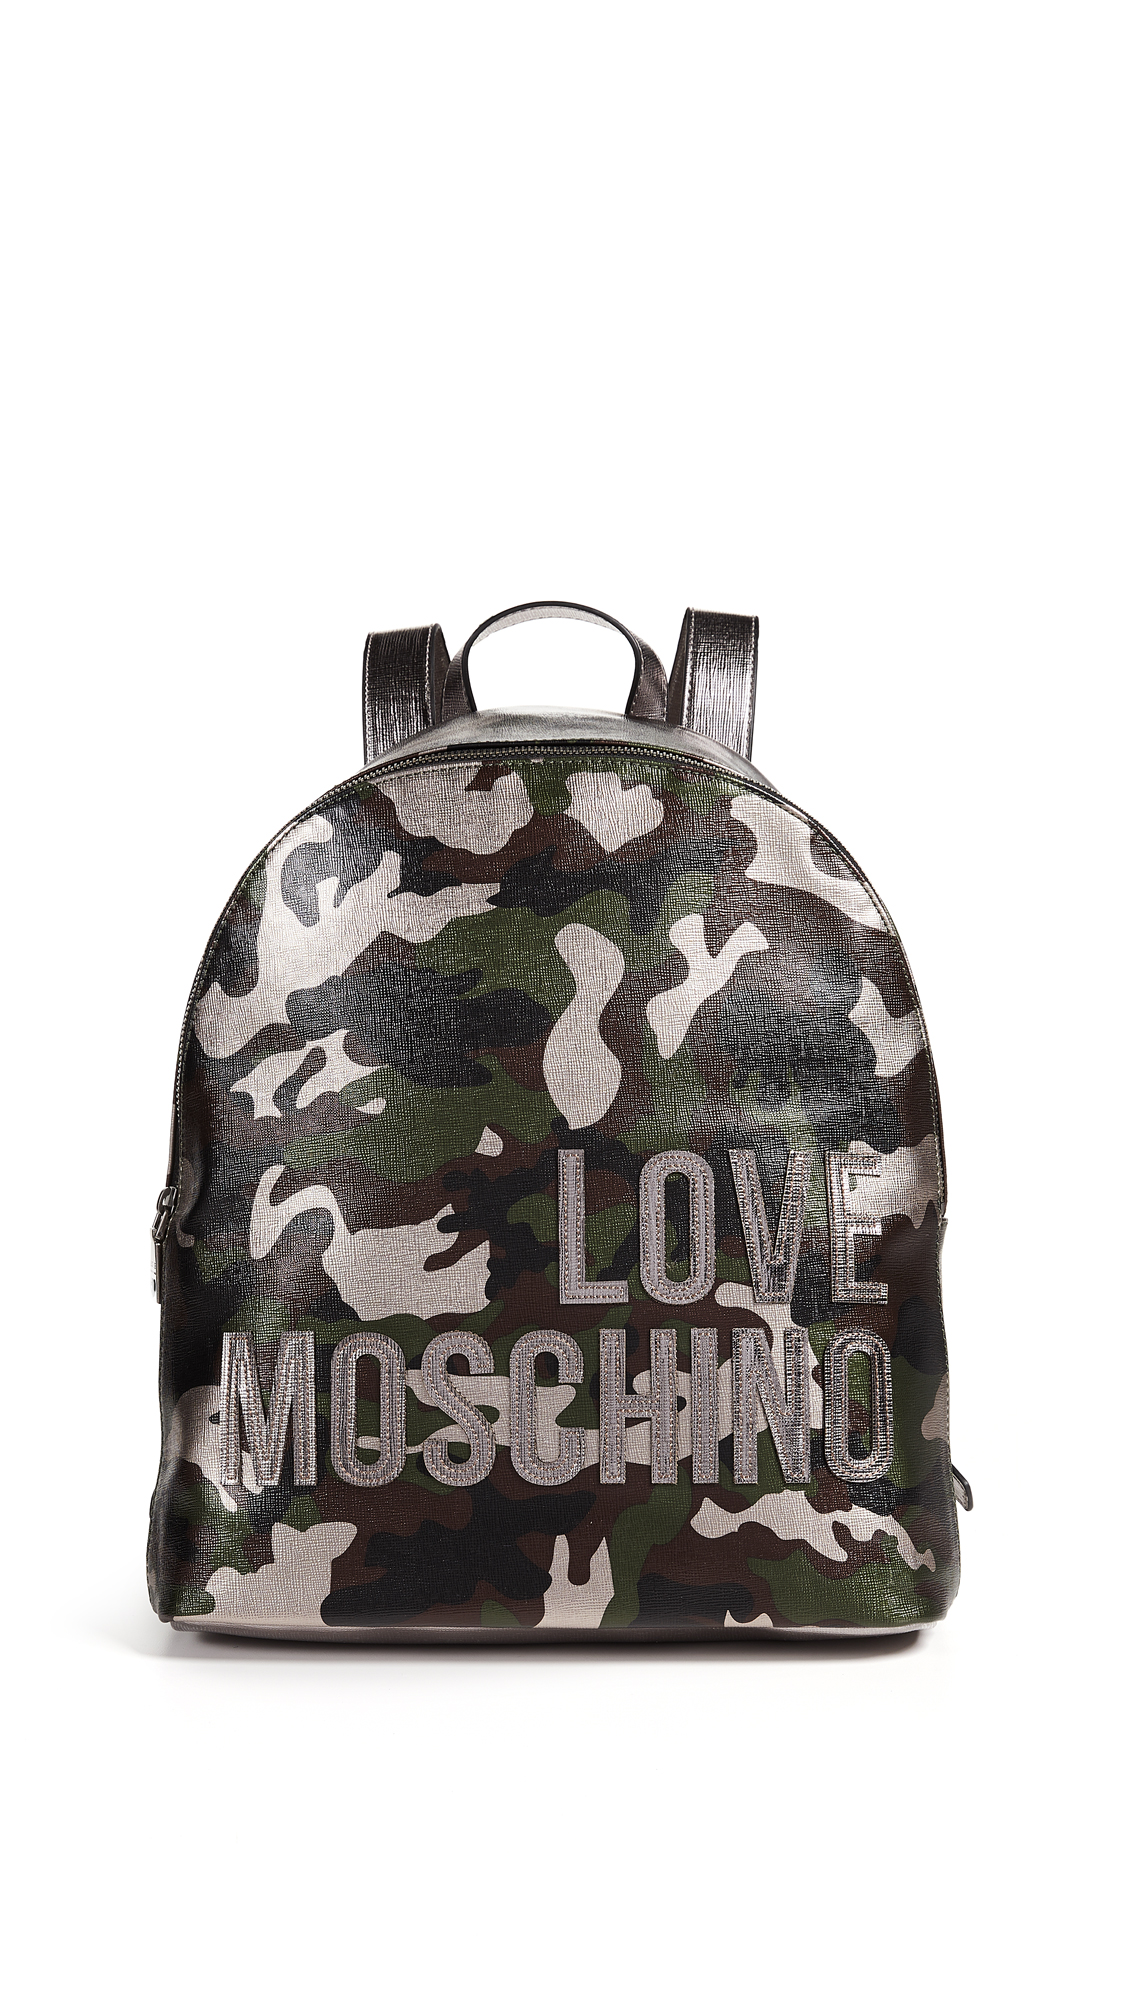 Moschino Love Moschino Camo Backpack - Multi